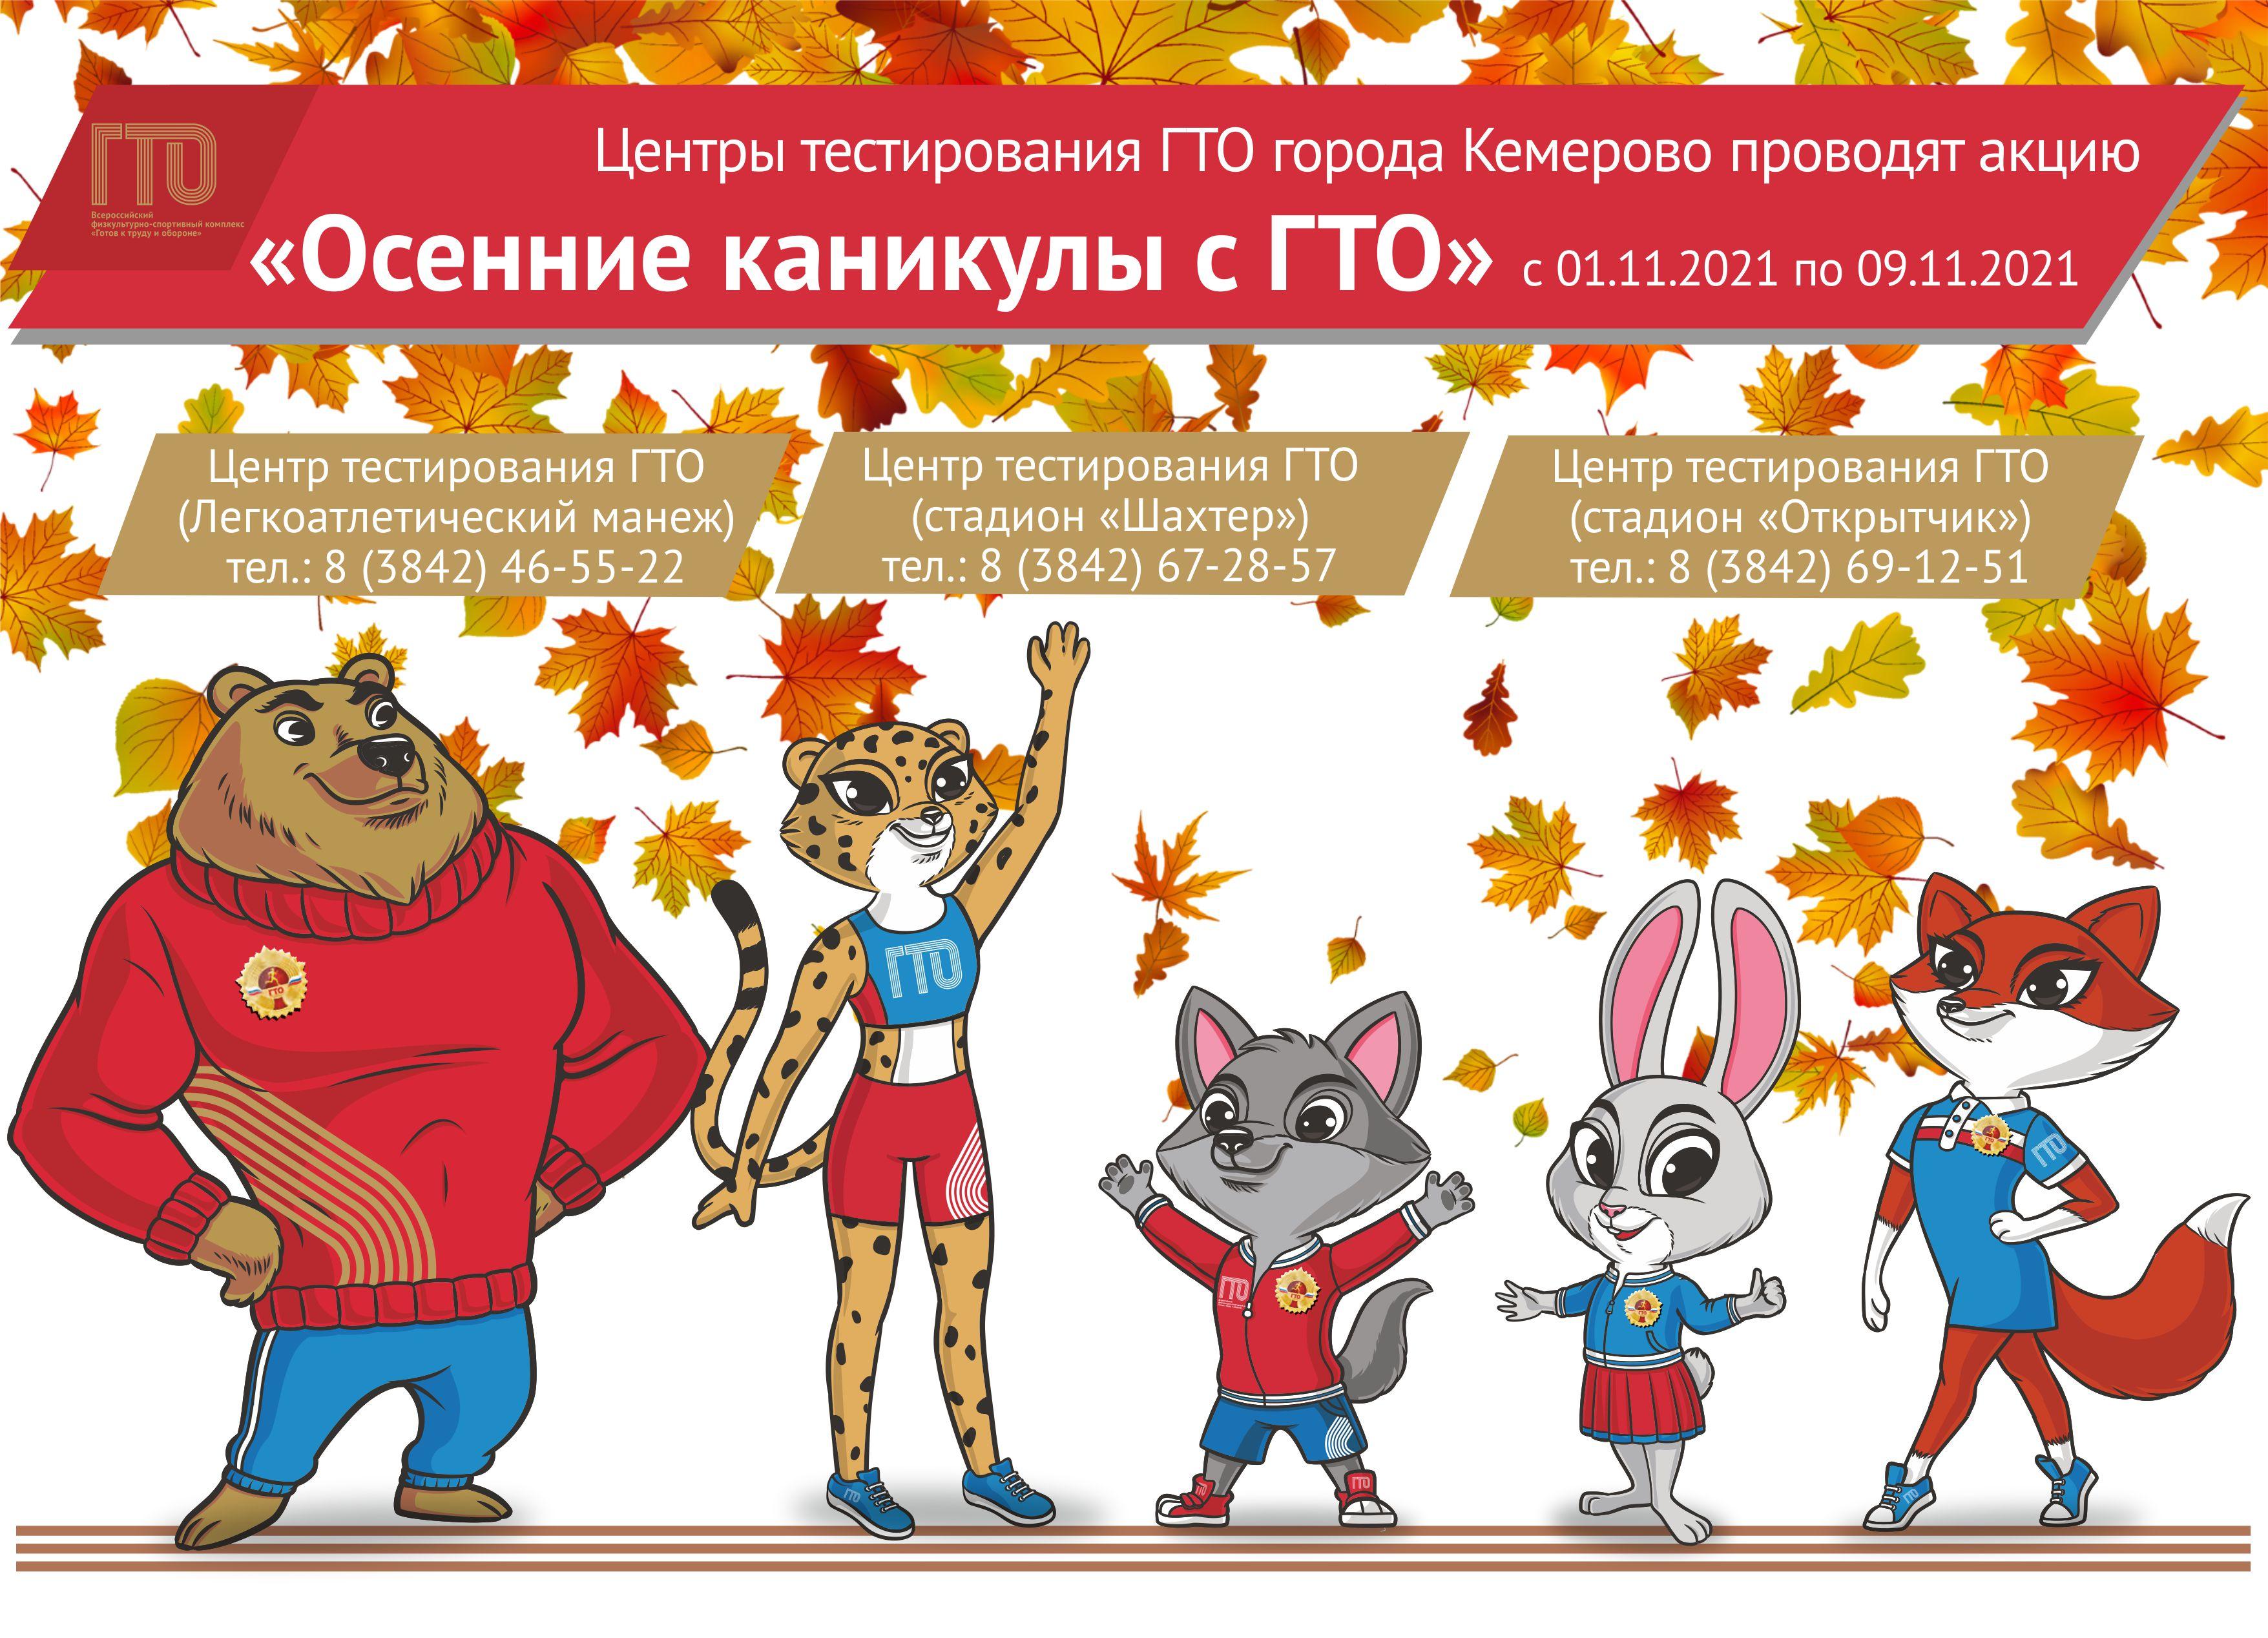 Осенние каникулы с ГТО!